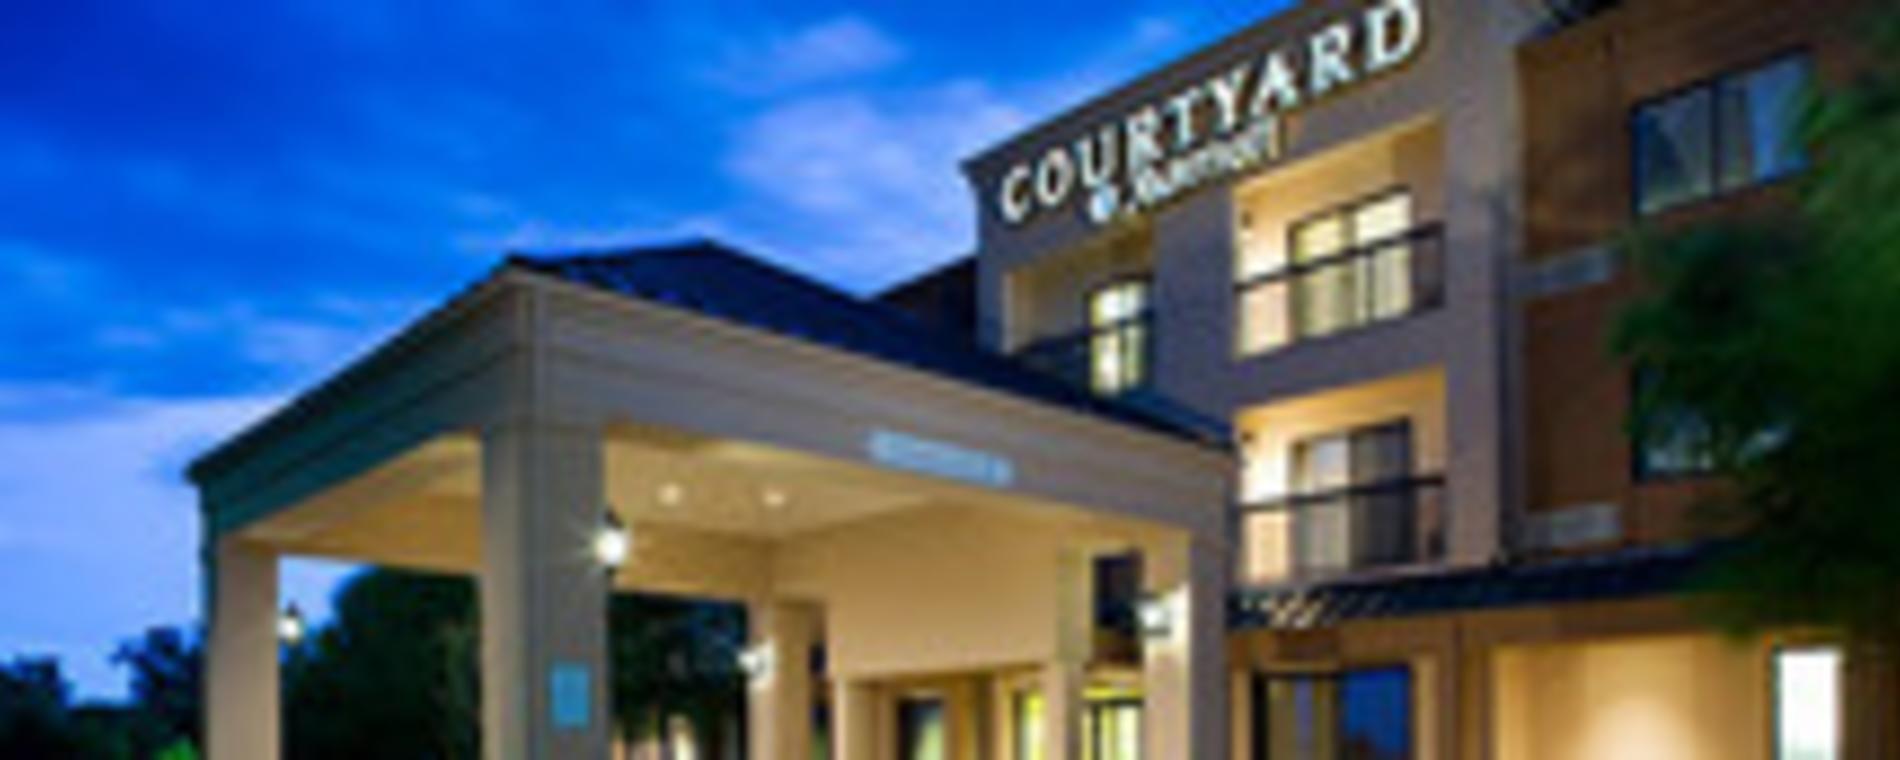 Courtyard by Marriott-Wichita East